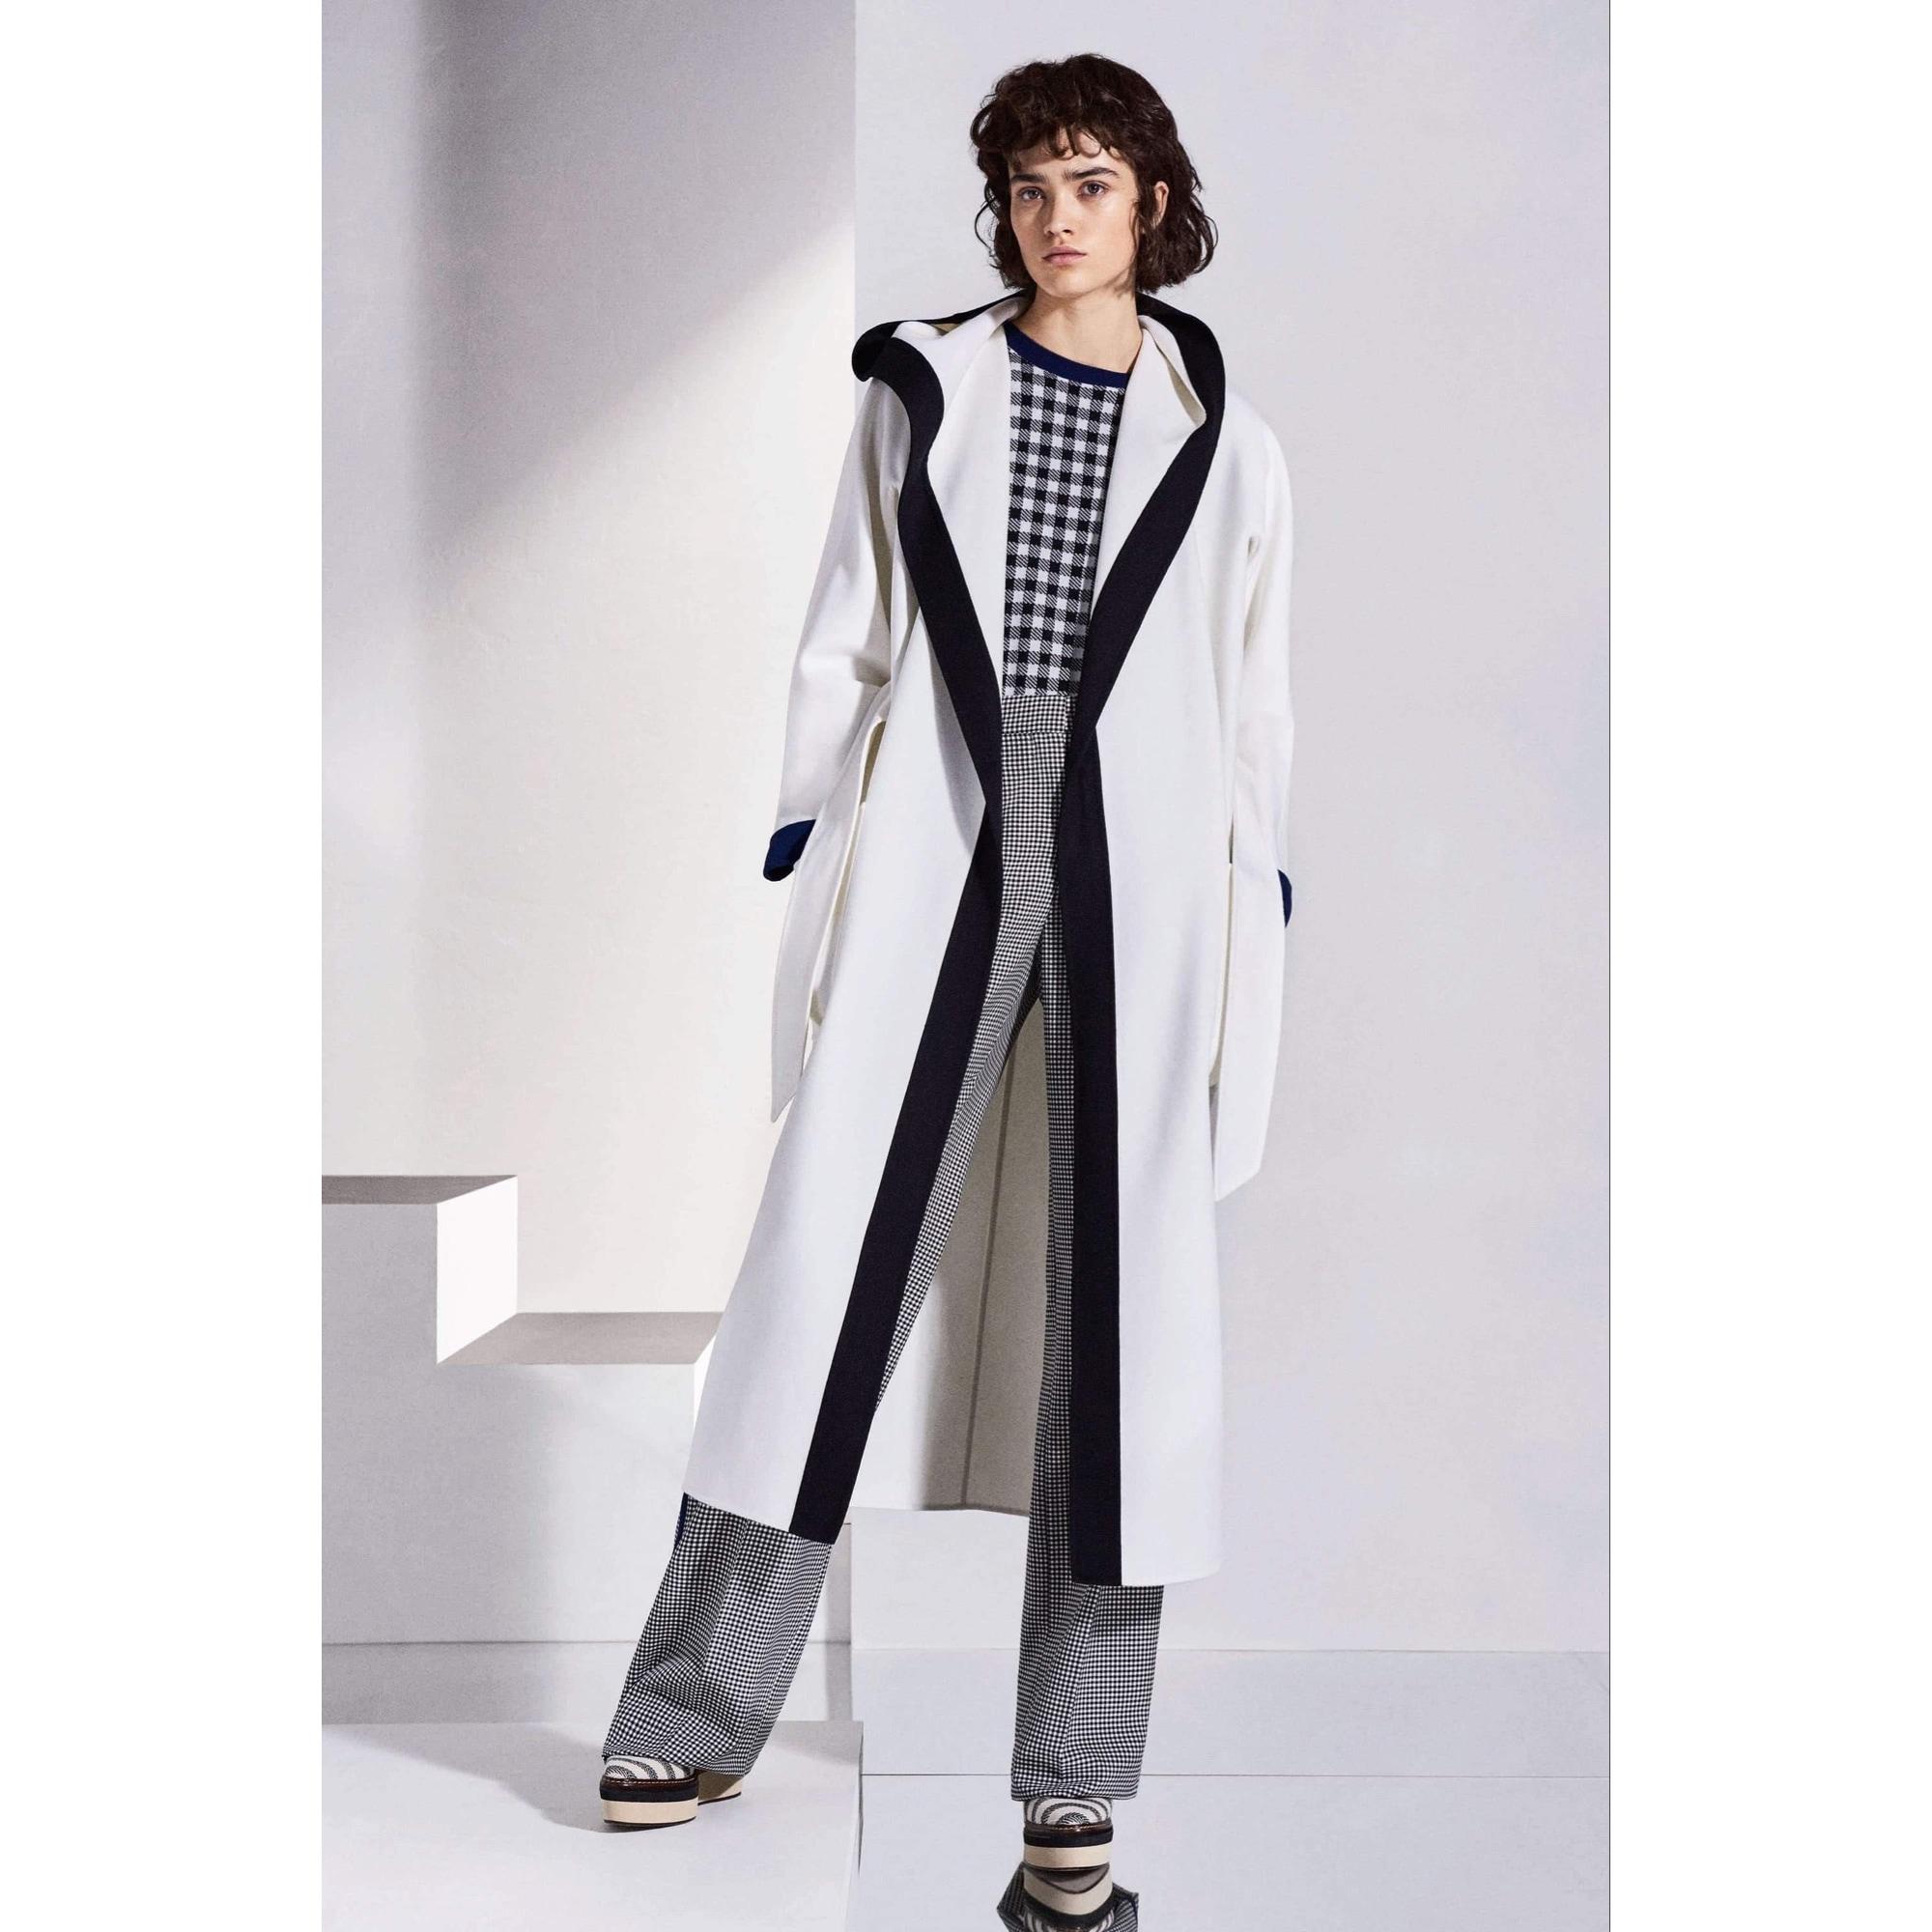 Manteau MAX MARA Blanc, blanc cassé, écru